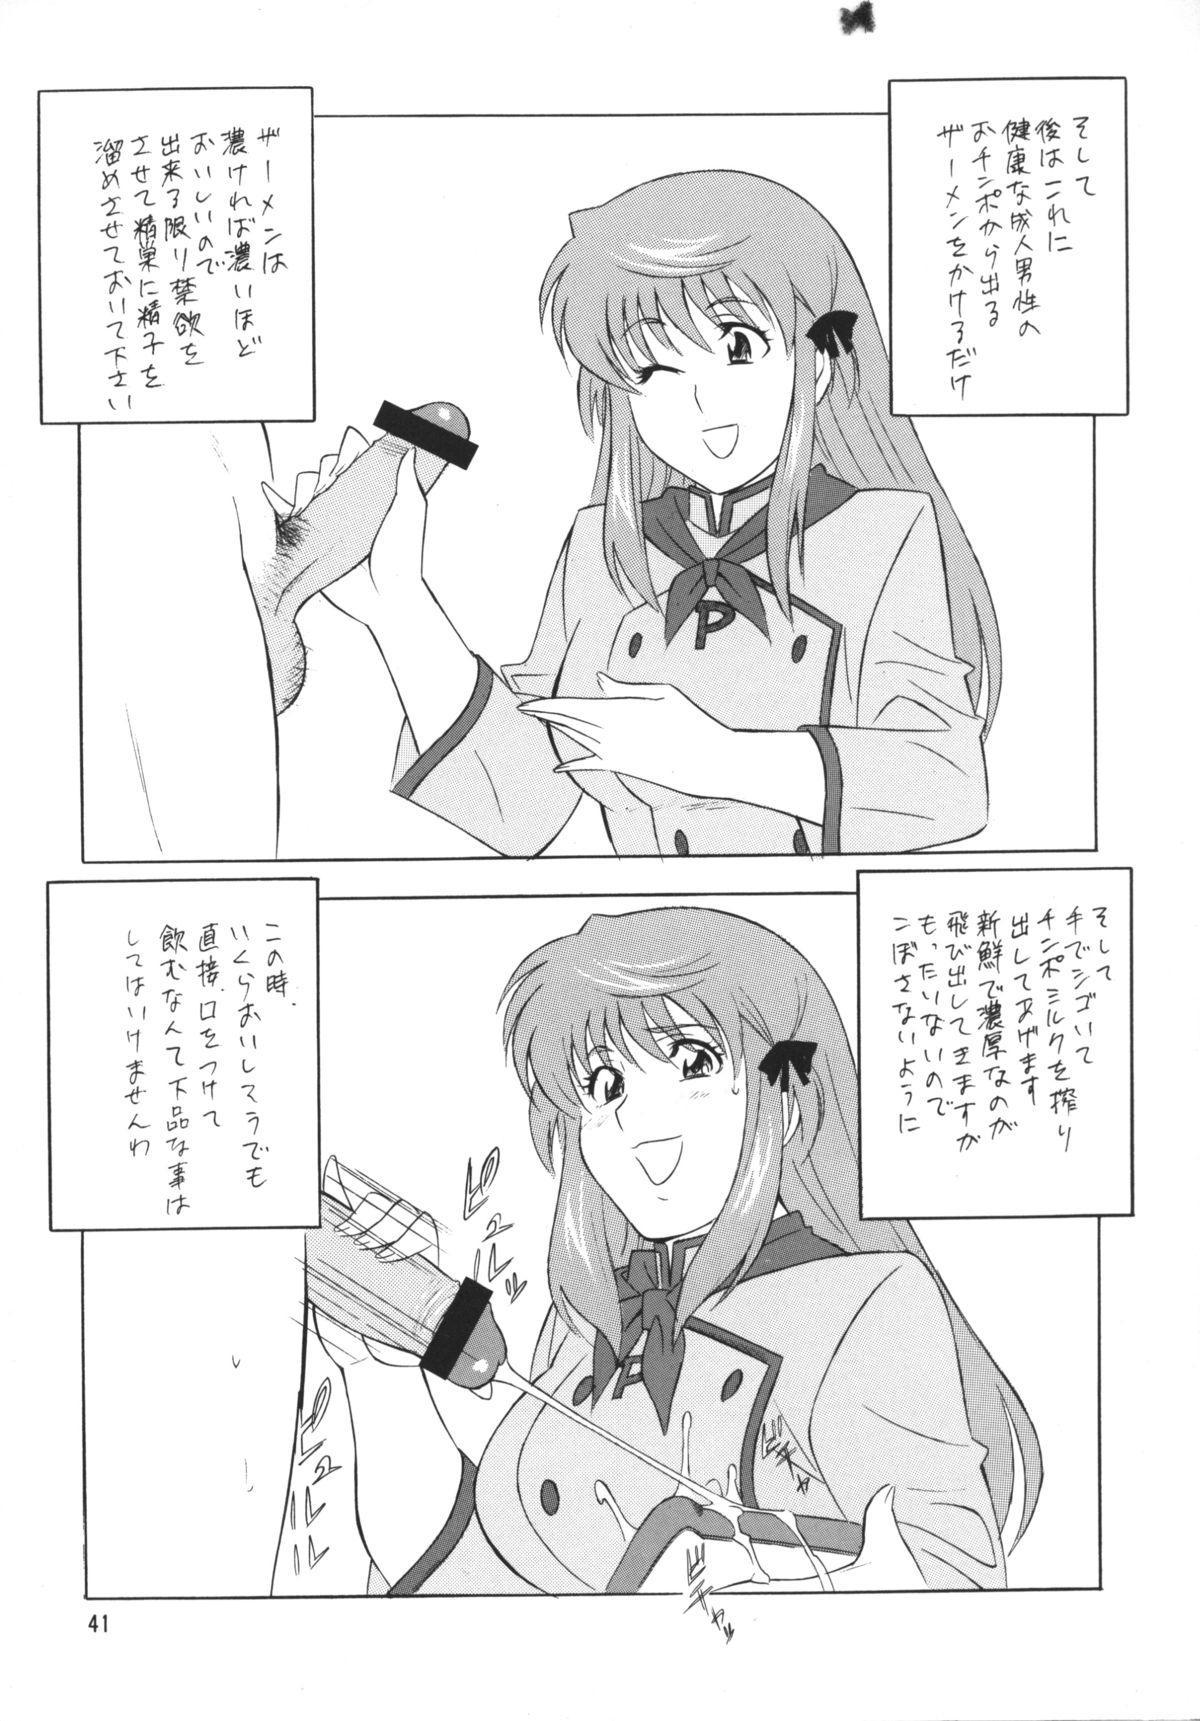 [Okachimentaiko (H-H, Minazuki Akira) Oh! Hentai (Various) 39